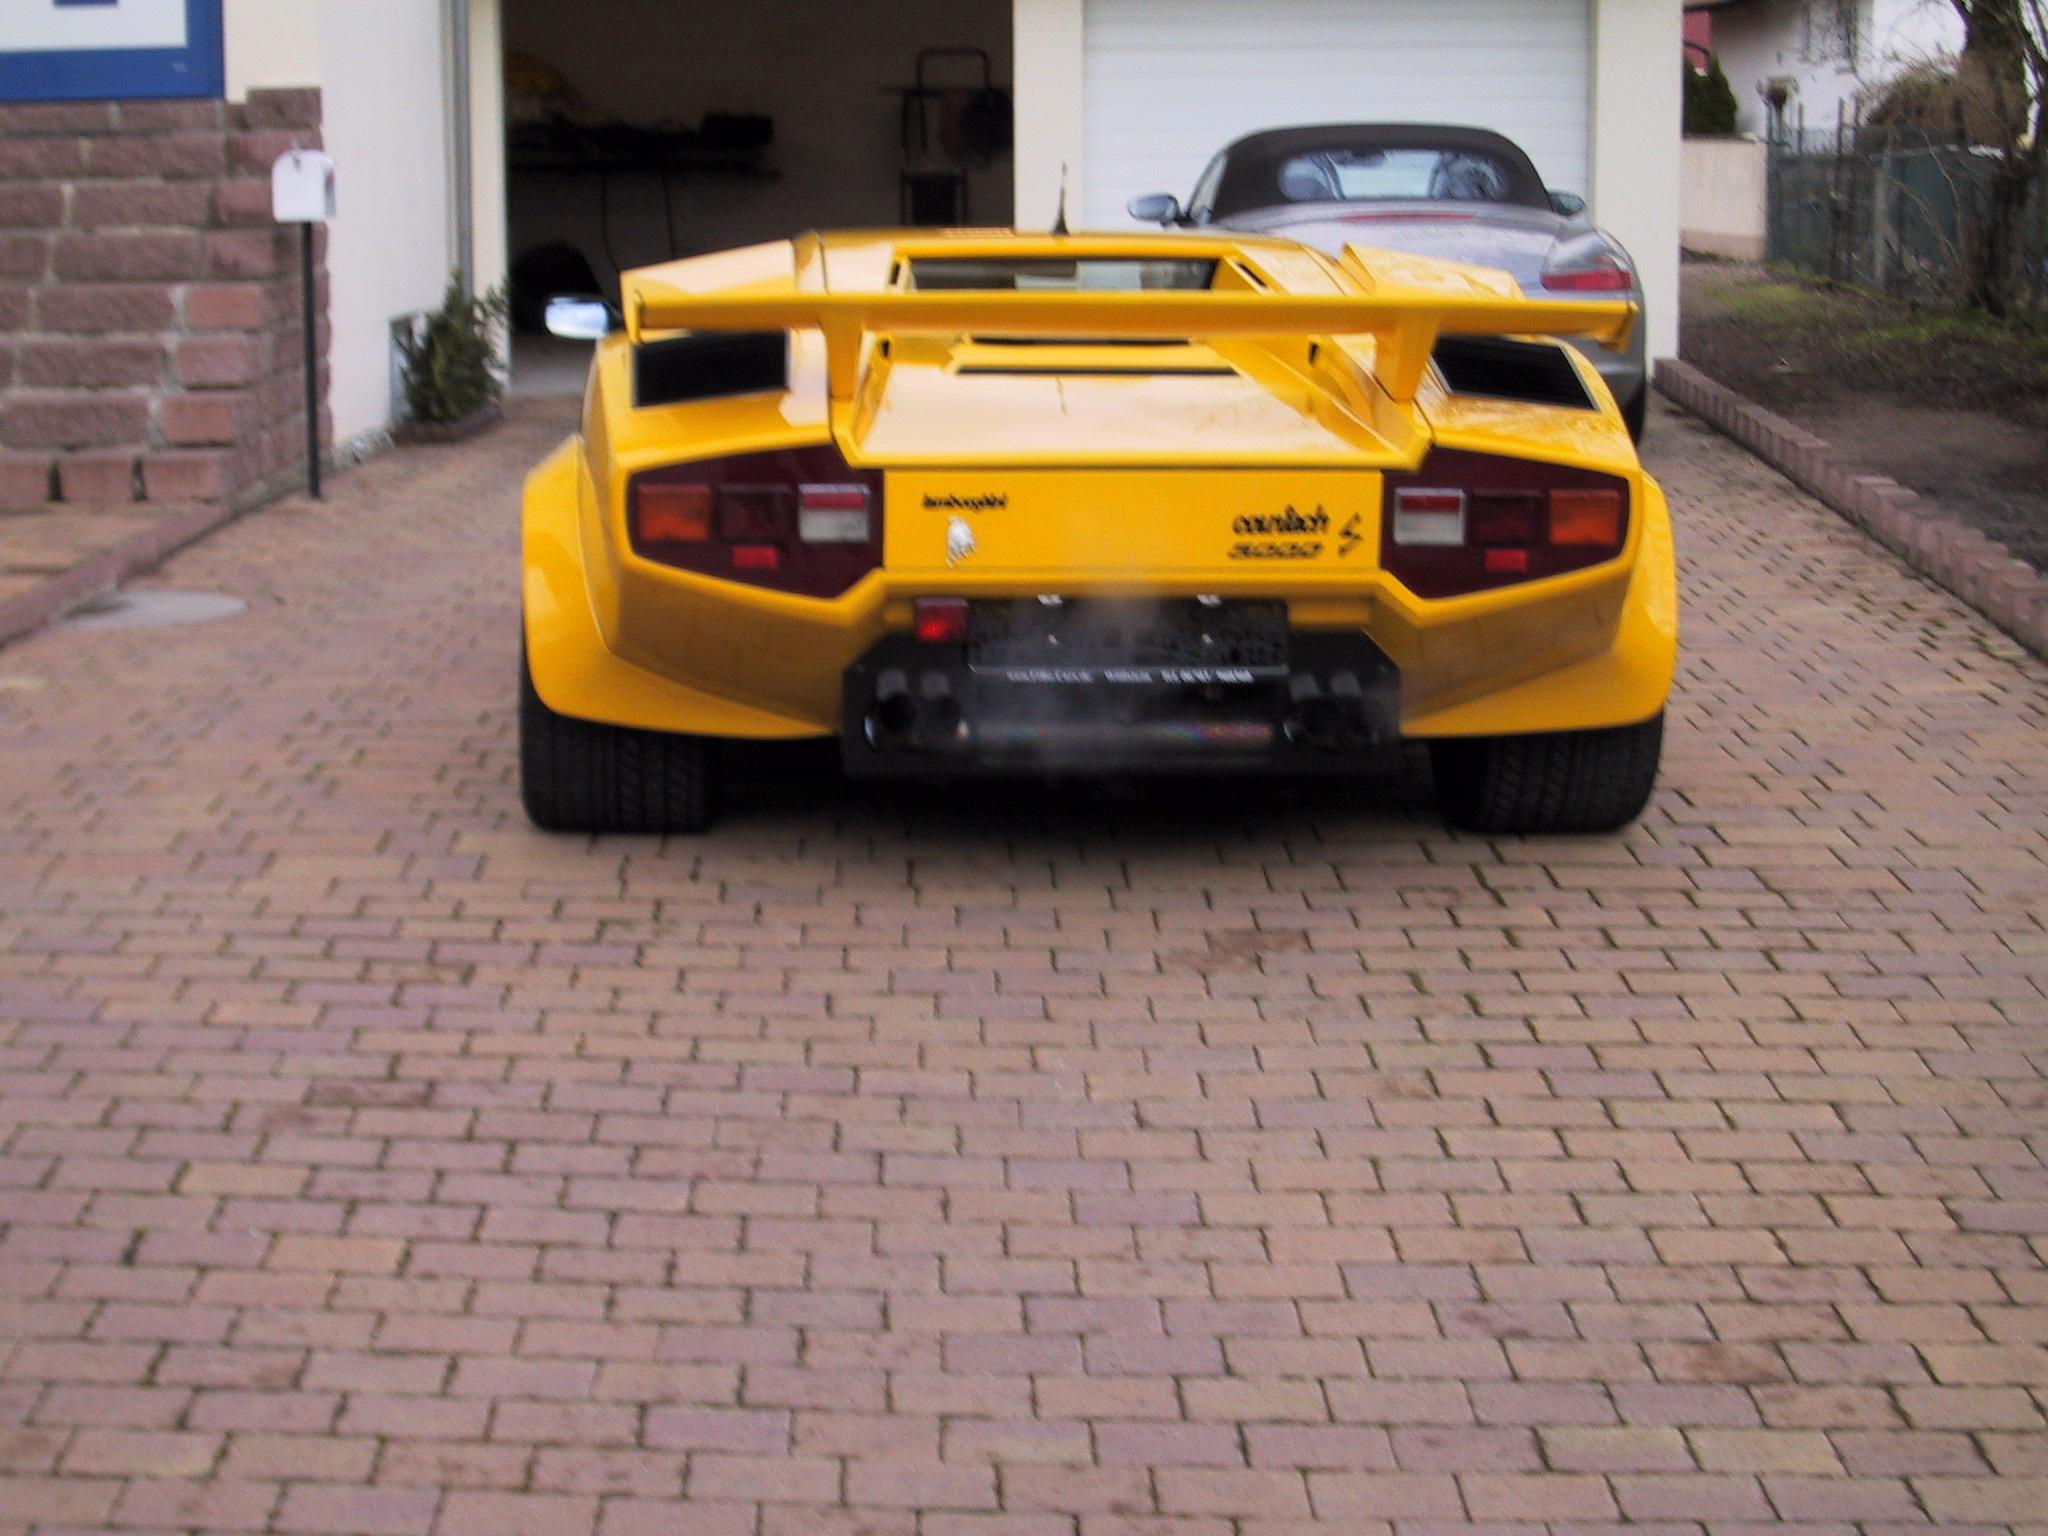 Lambobilder%20001 Wonderful Lamborghini Countach Strohm De Rella Cars Trend